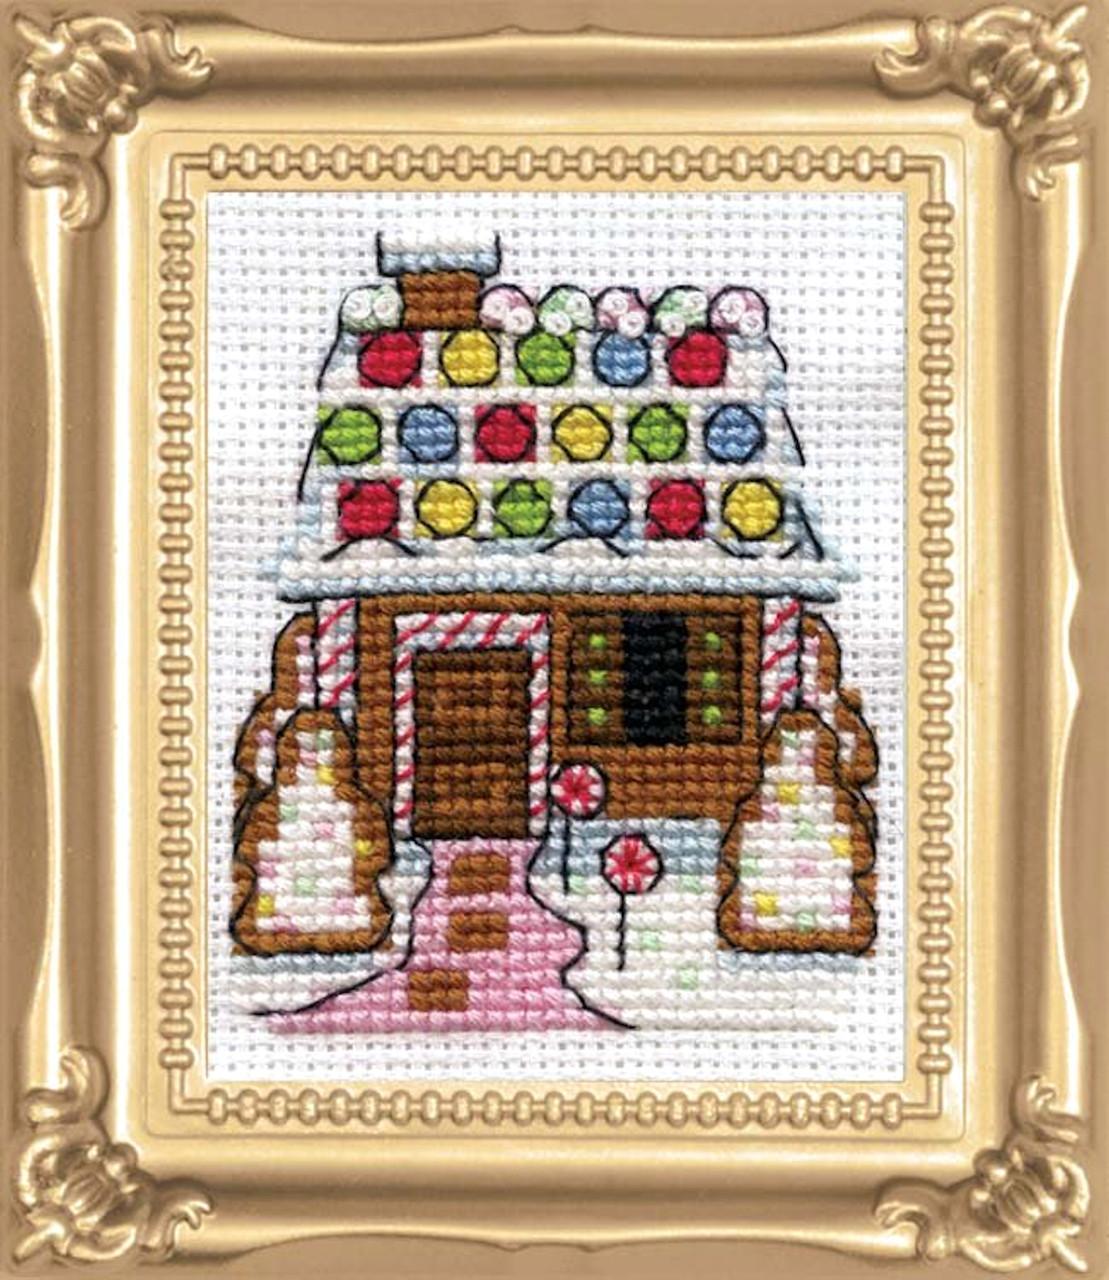 Design Works - Gingerbread House Picture Kit w/Frame - CrossStitchWorld